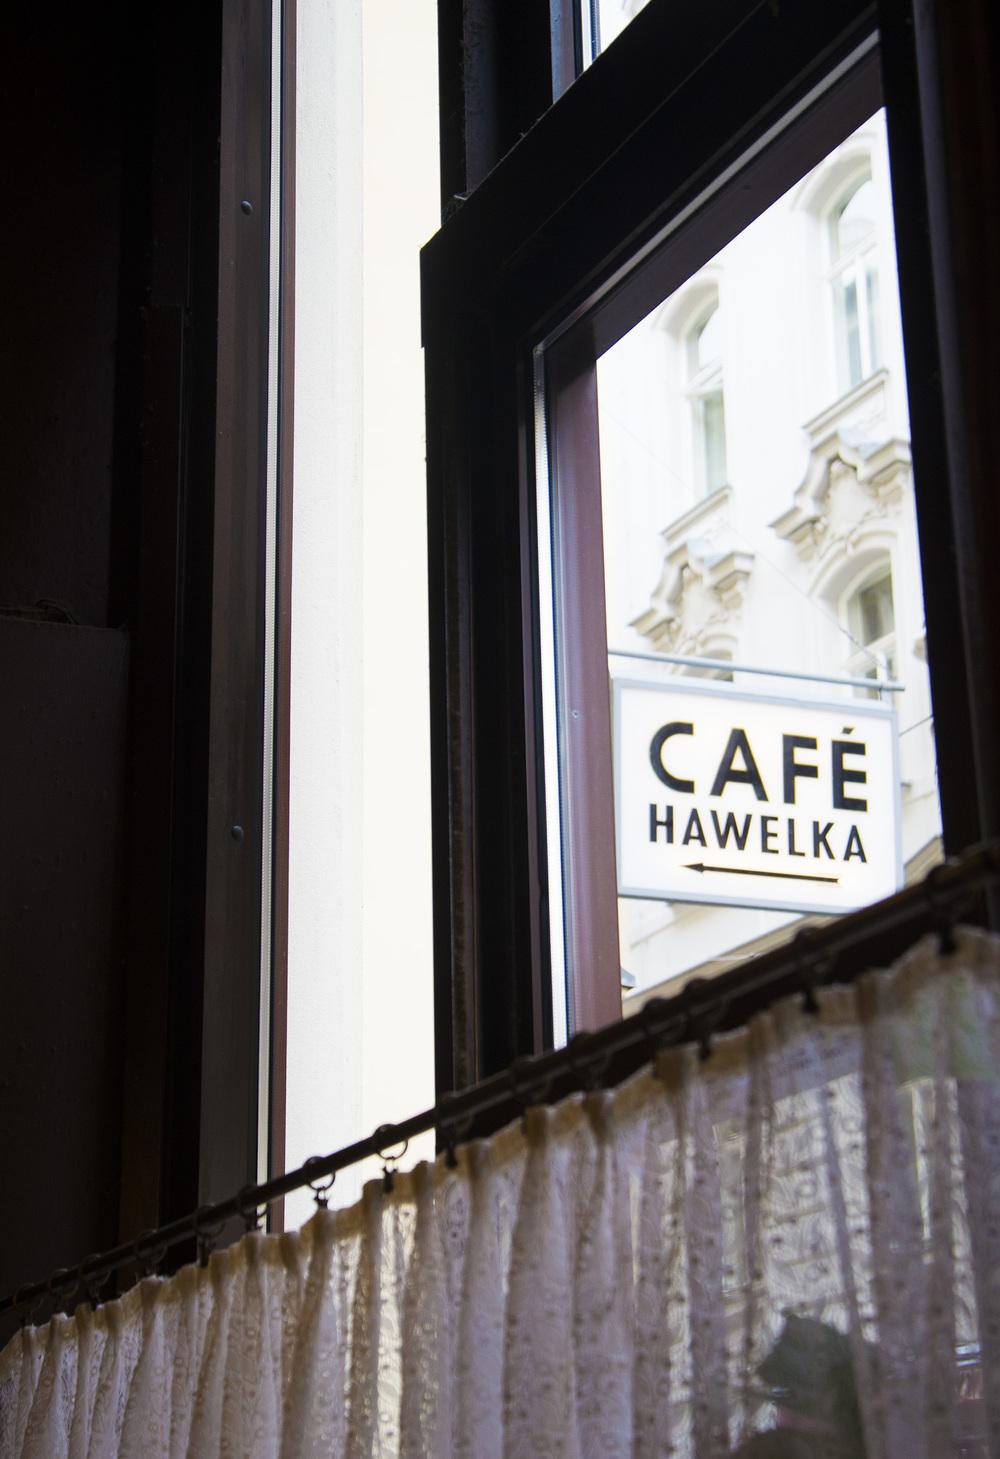 Cafe Hawelka, 1939, Vienna